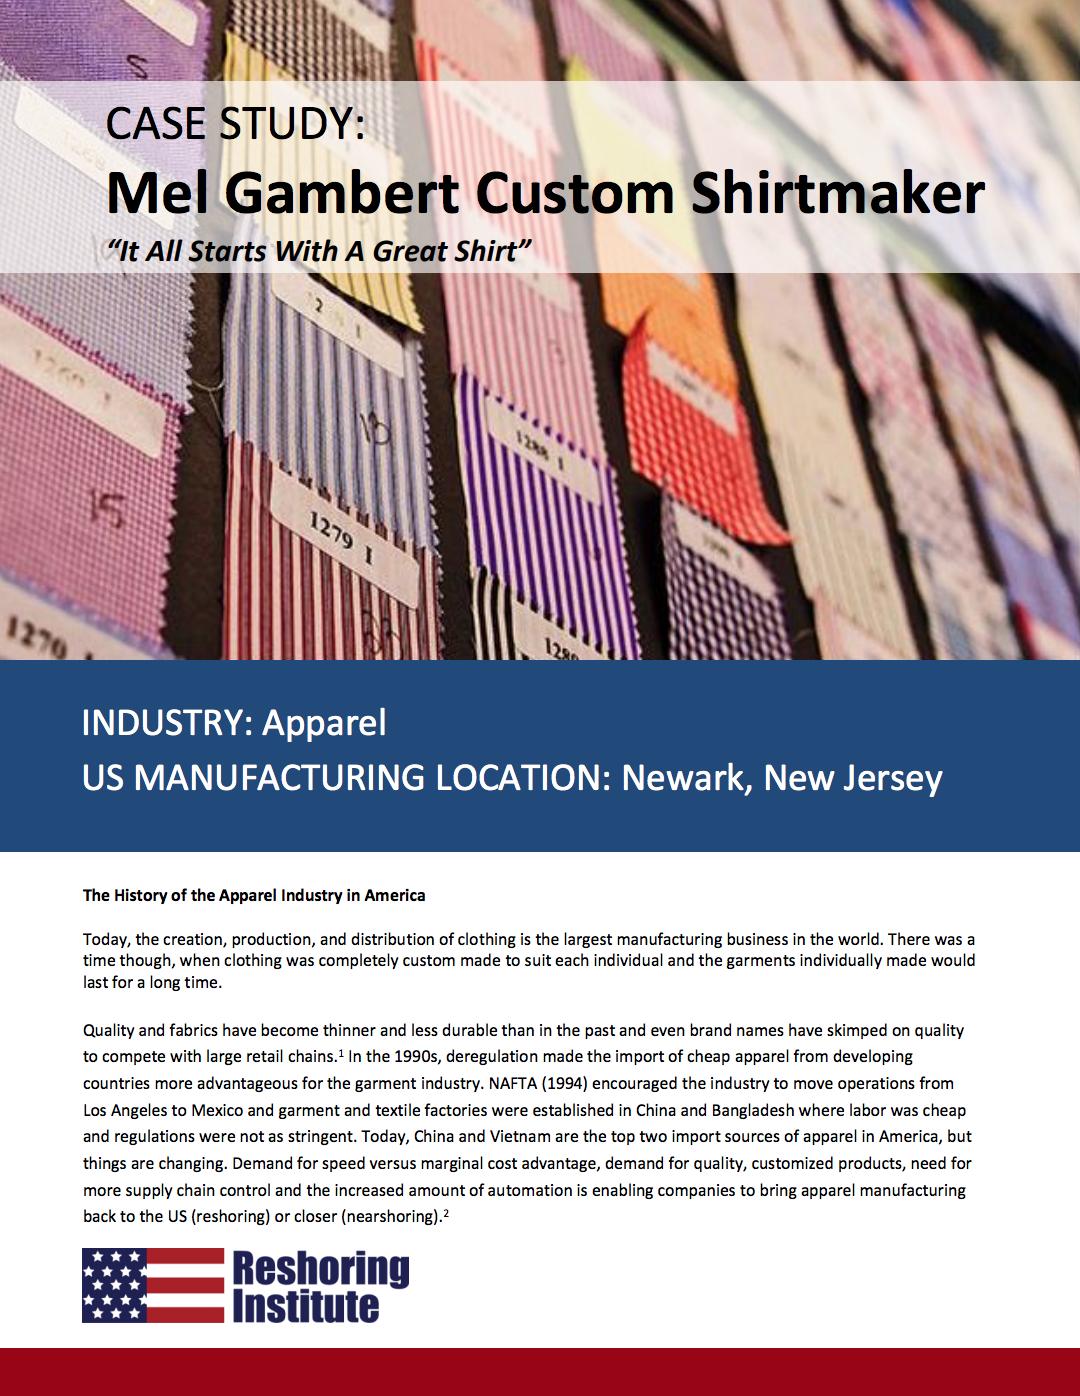 Mel Gambert Custom Shirts